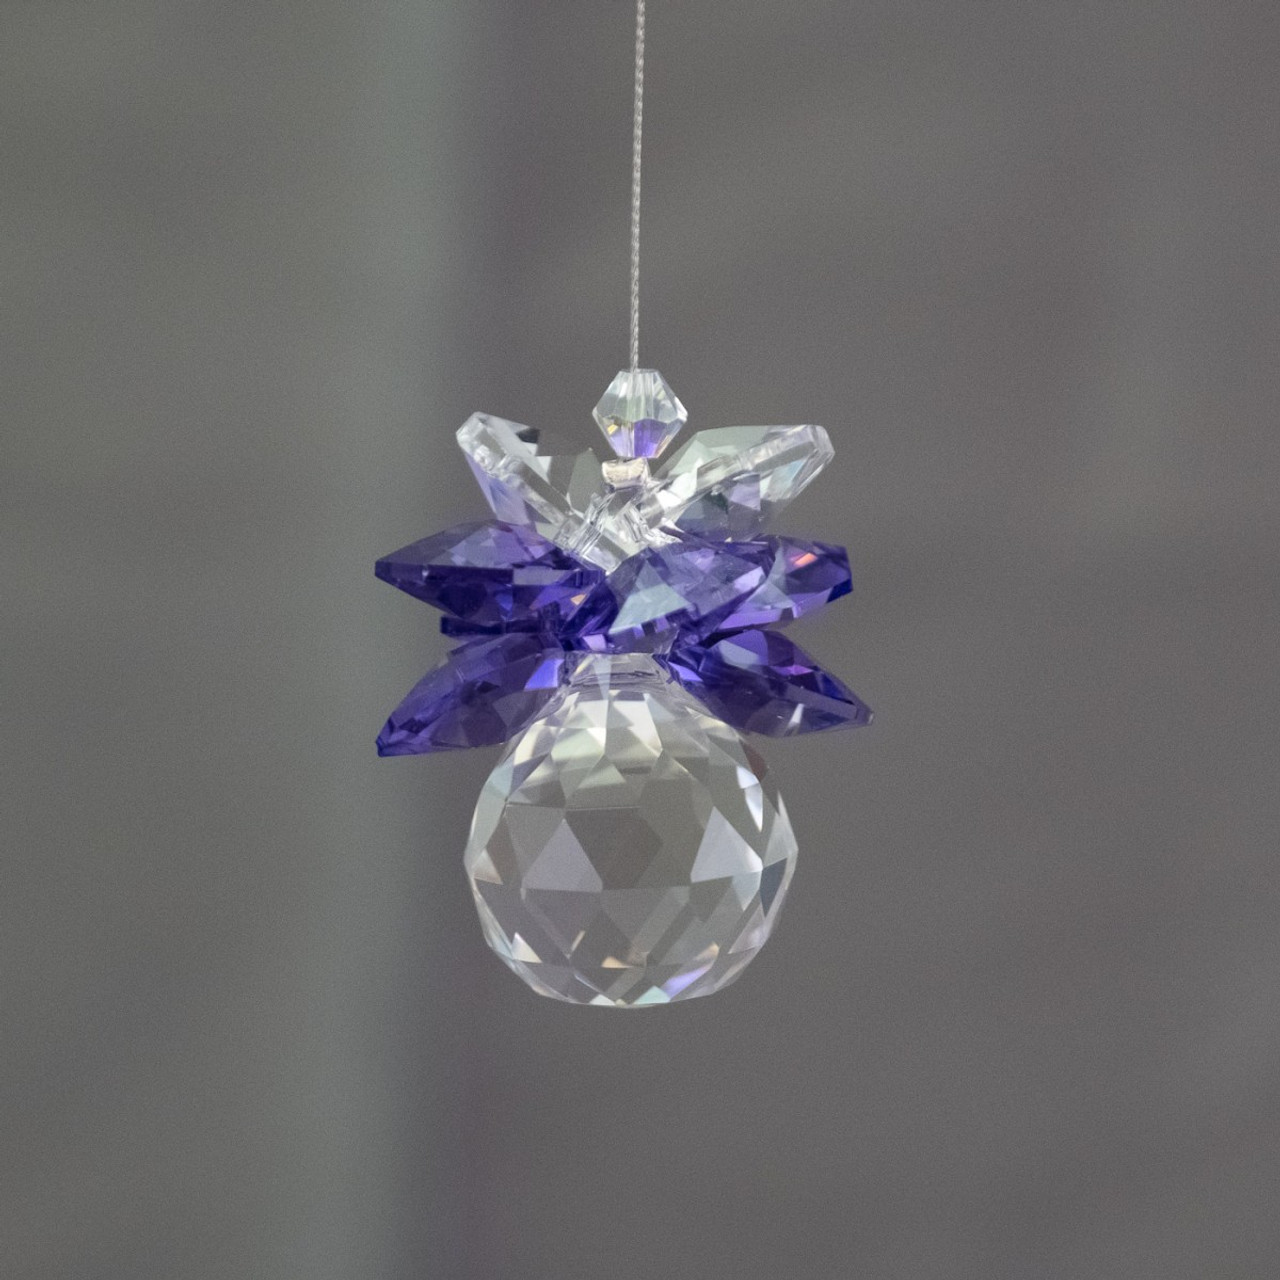 20mm Lead Crystal Sphere with Clear & Purple Suncatchers